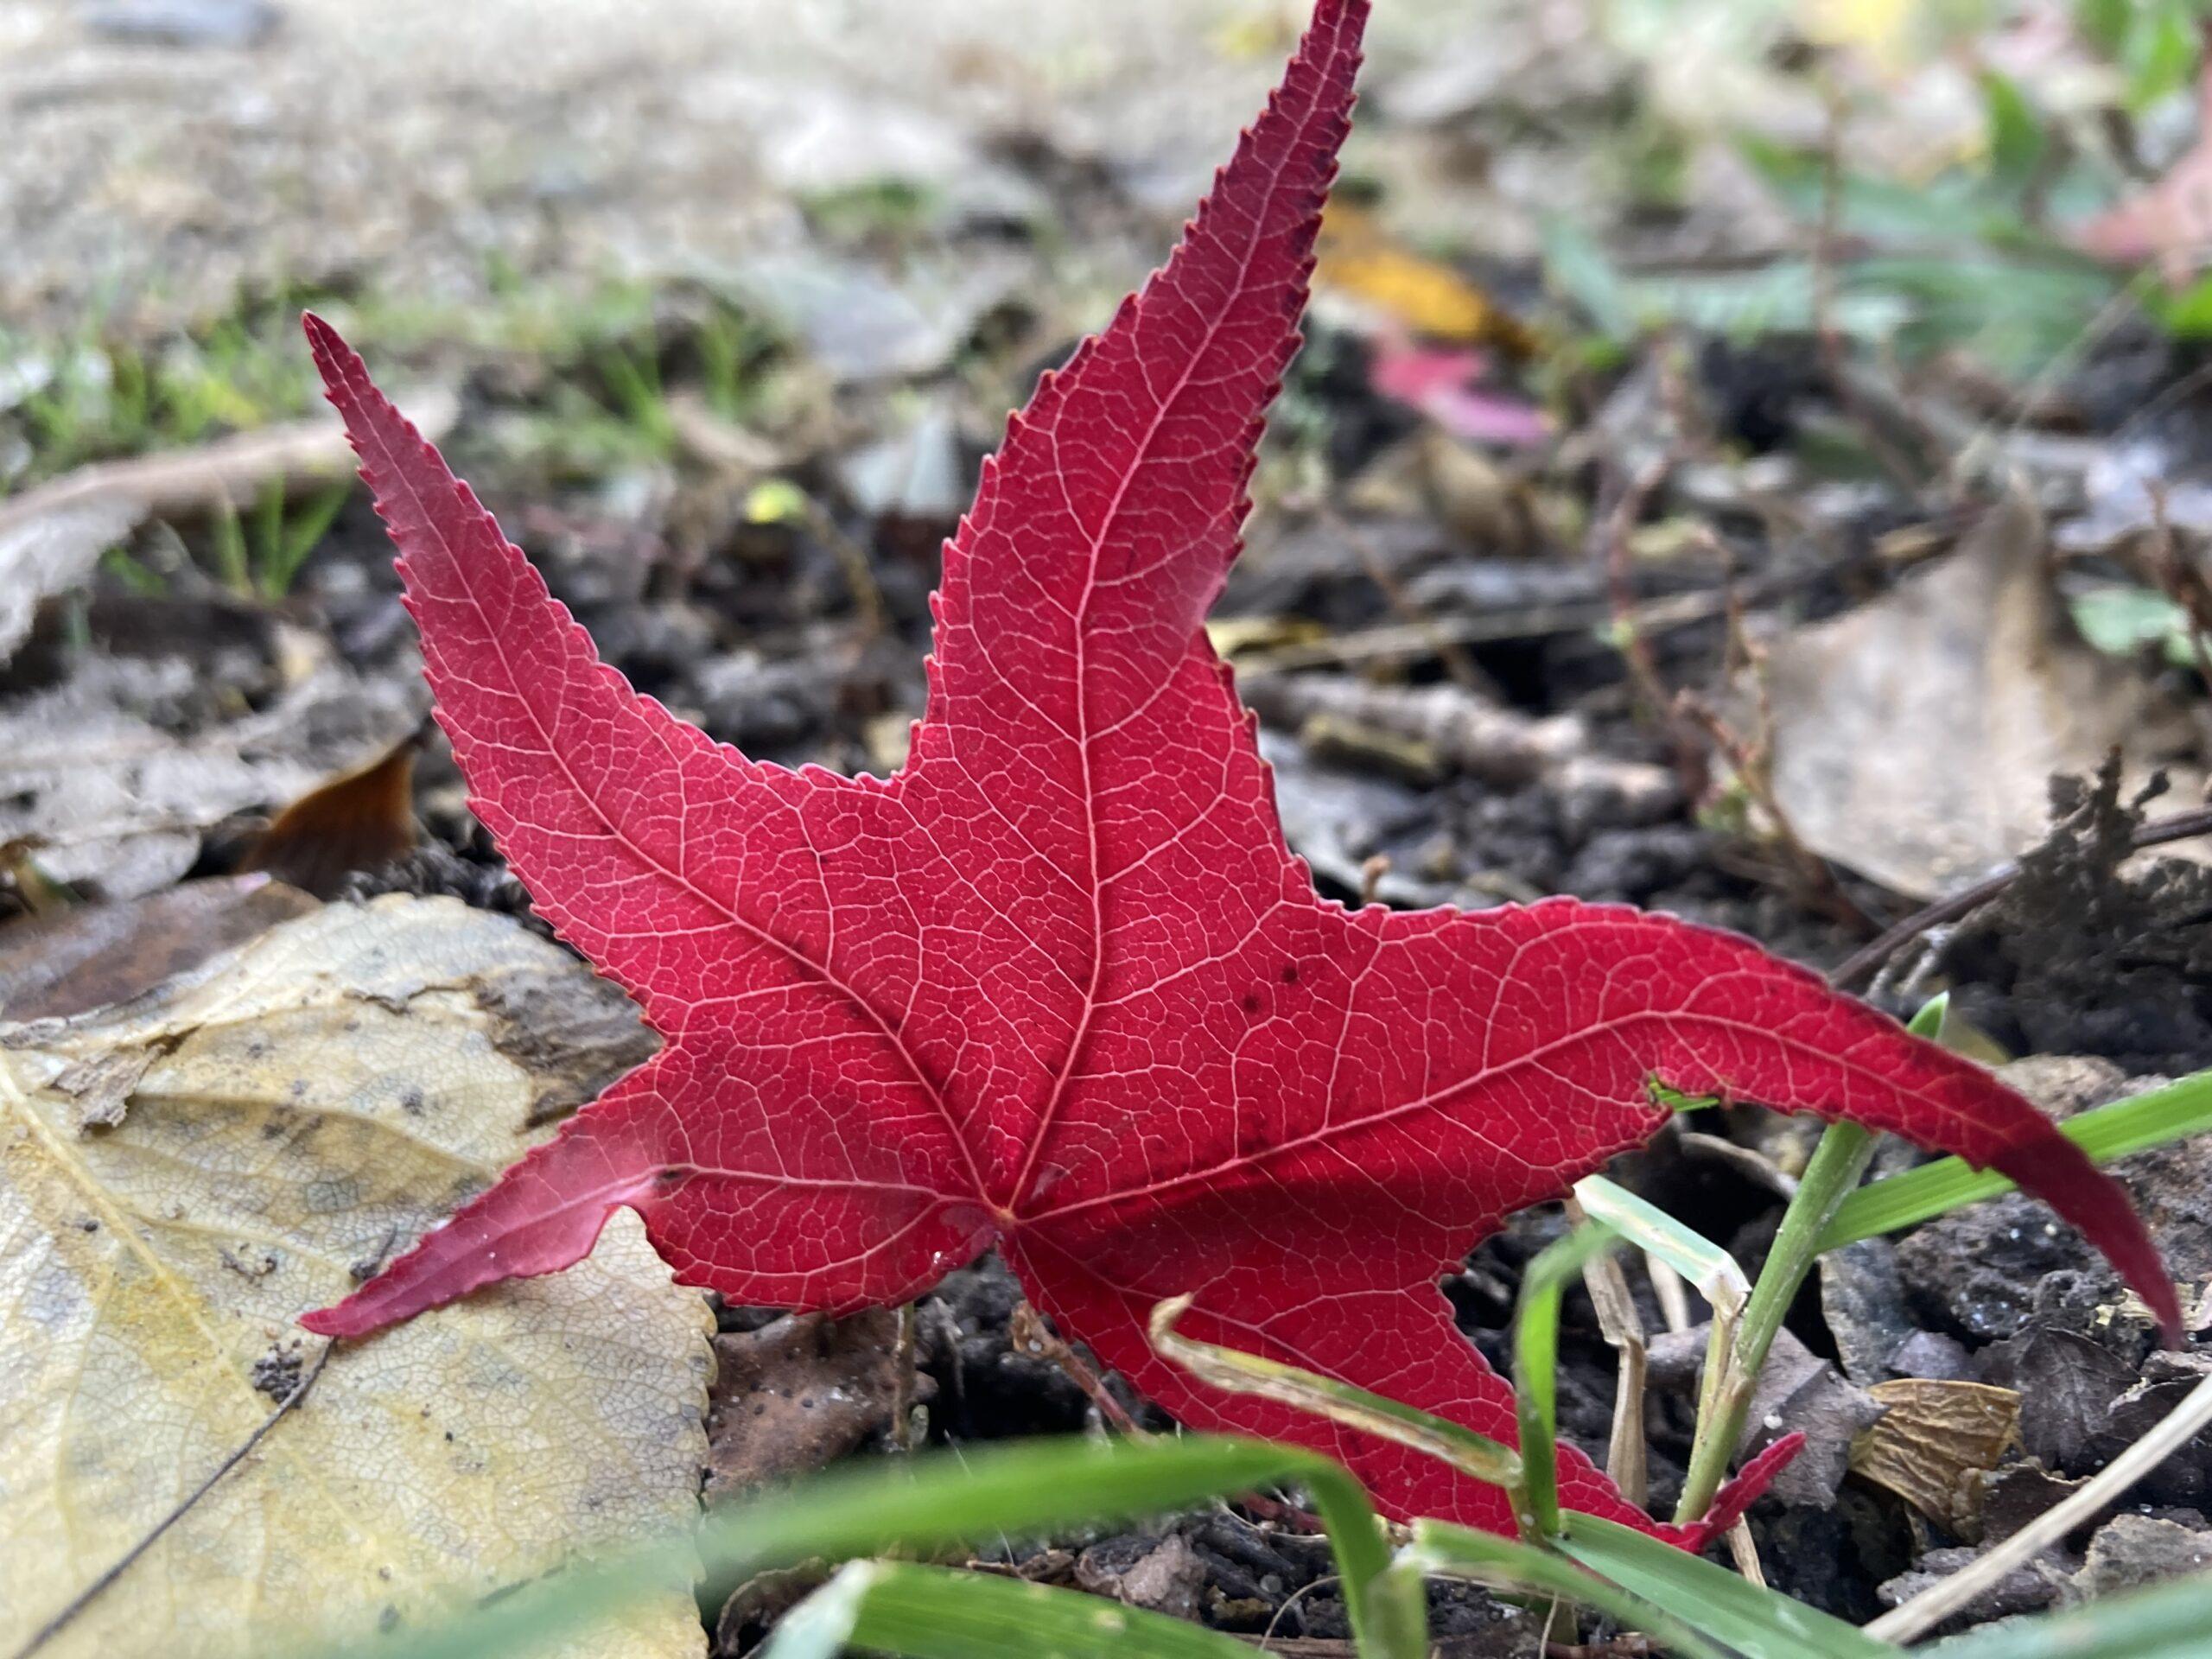 Leuchtend rotes Blatt am Boden